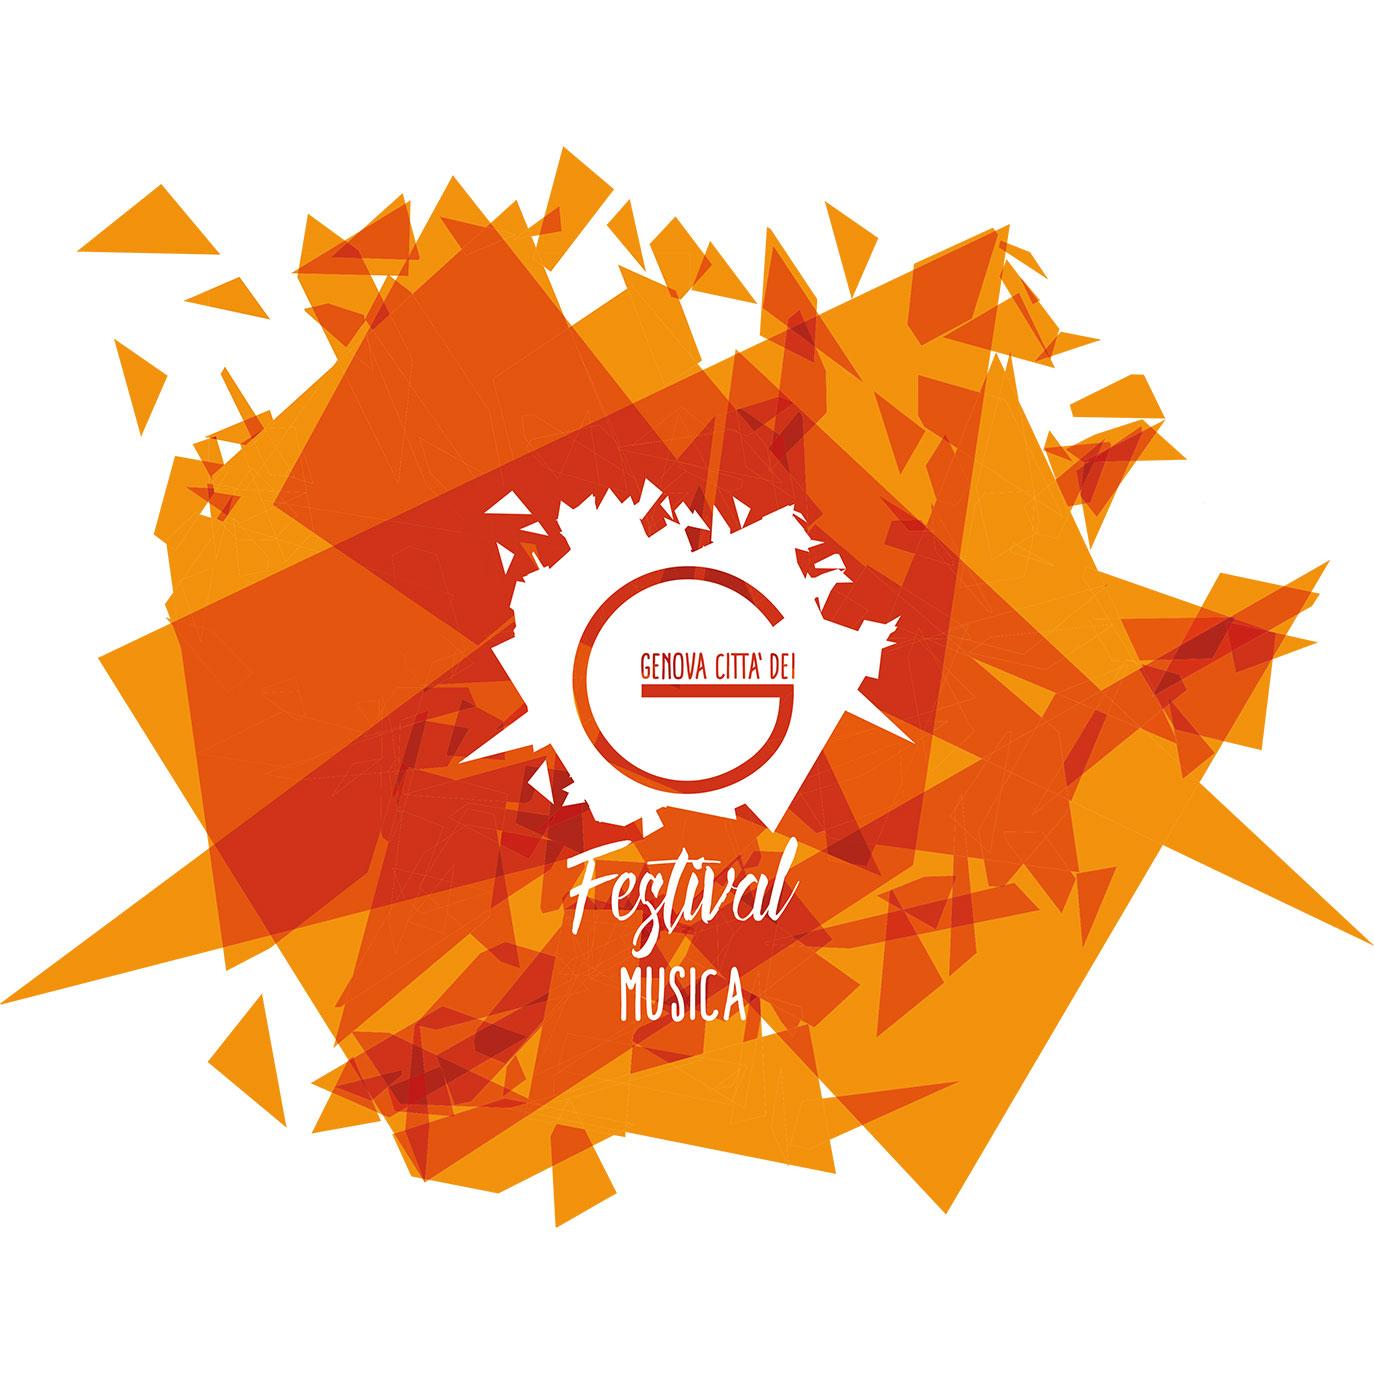 logo Genova città dei festival